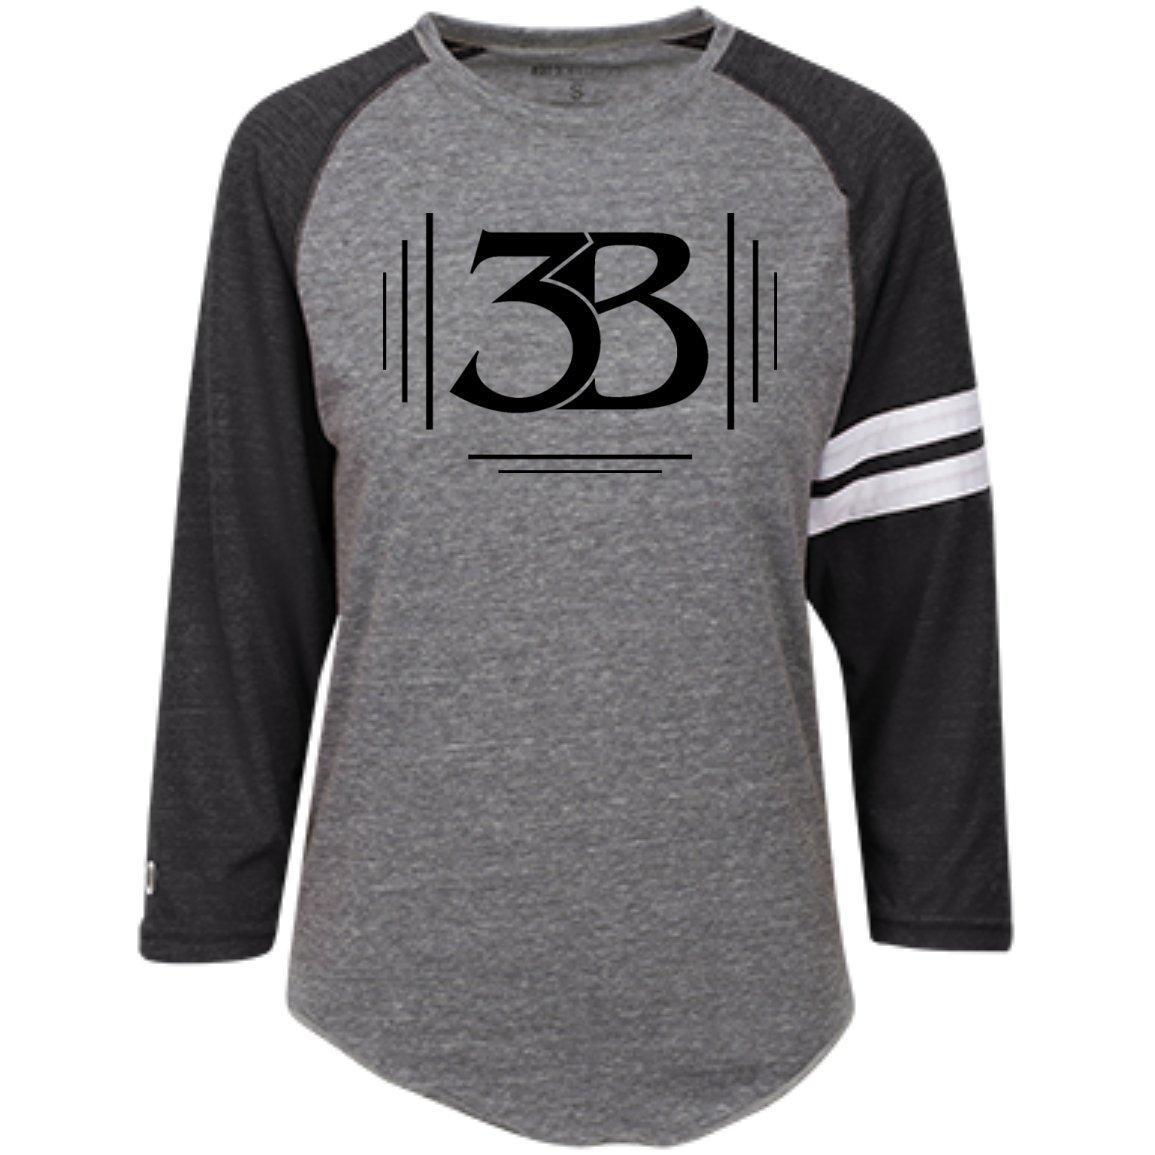 3B Heathered Vintage Shirt